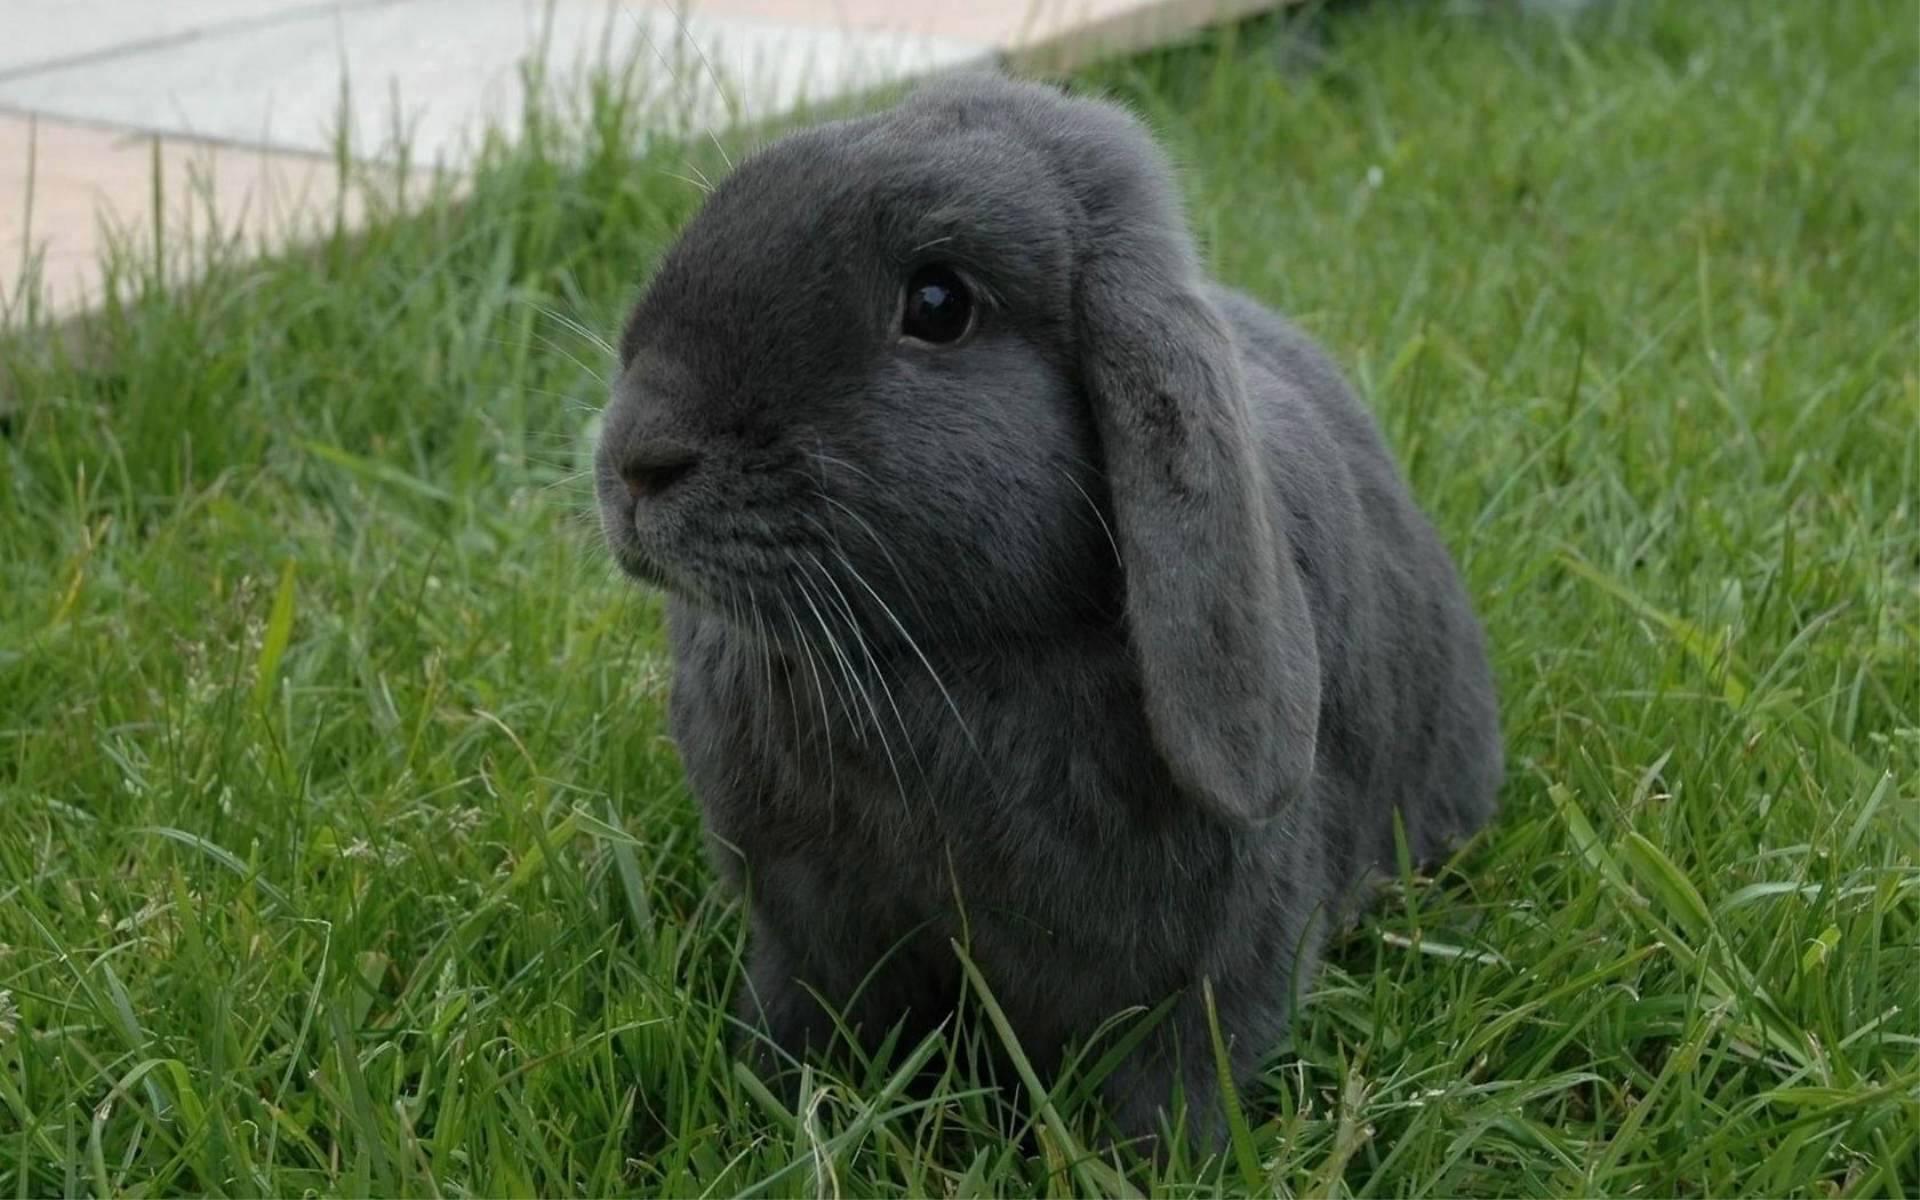 Love Wallpaper: Black Rabbit in Grass